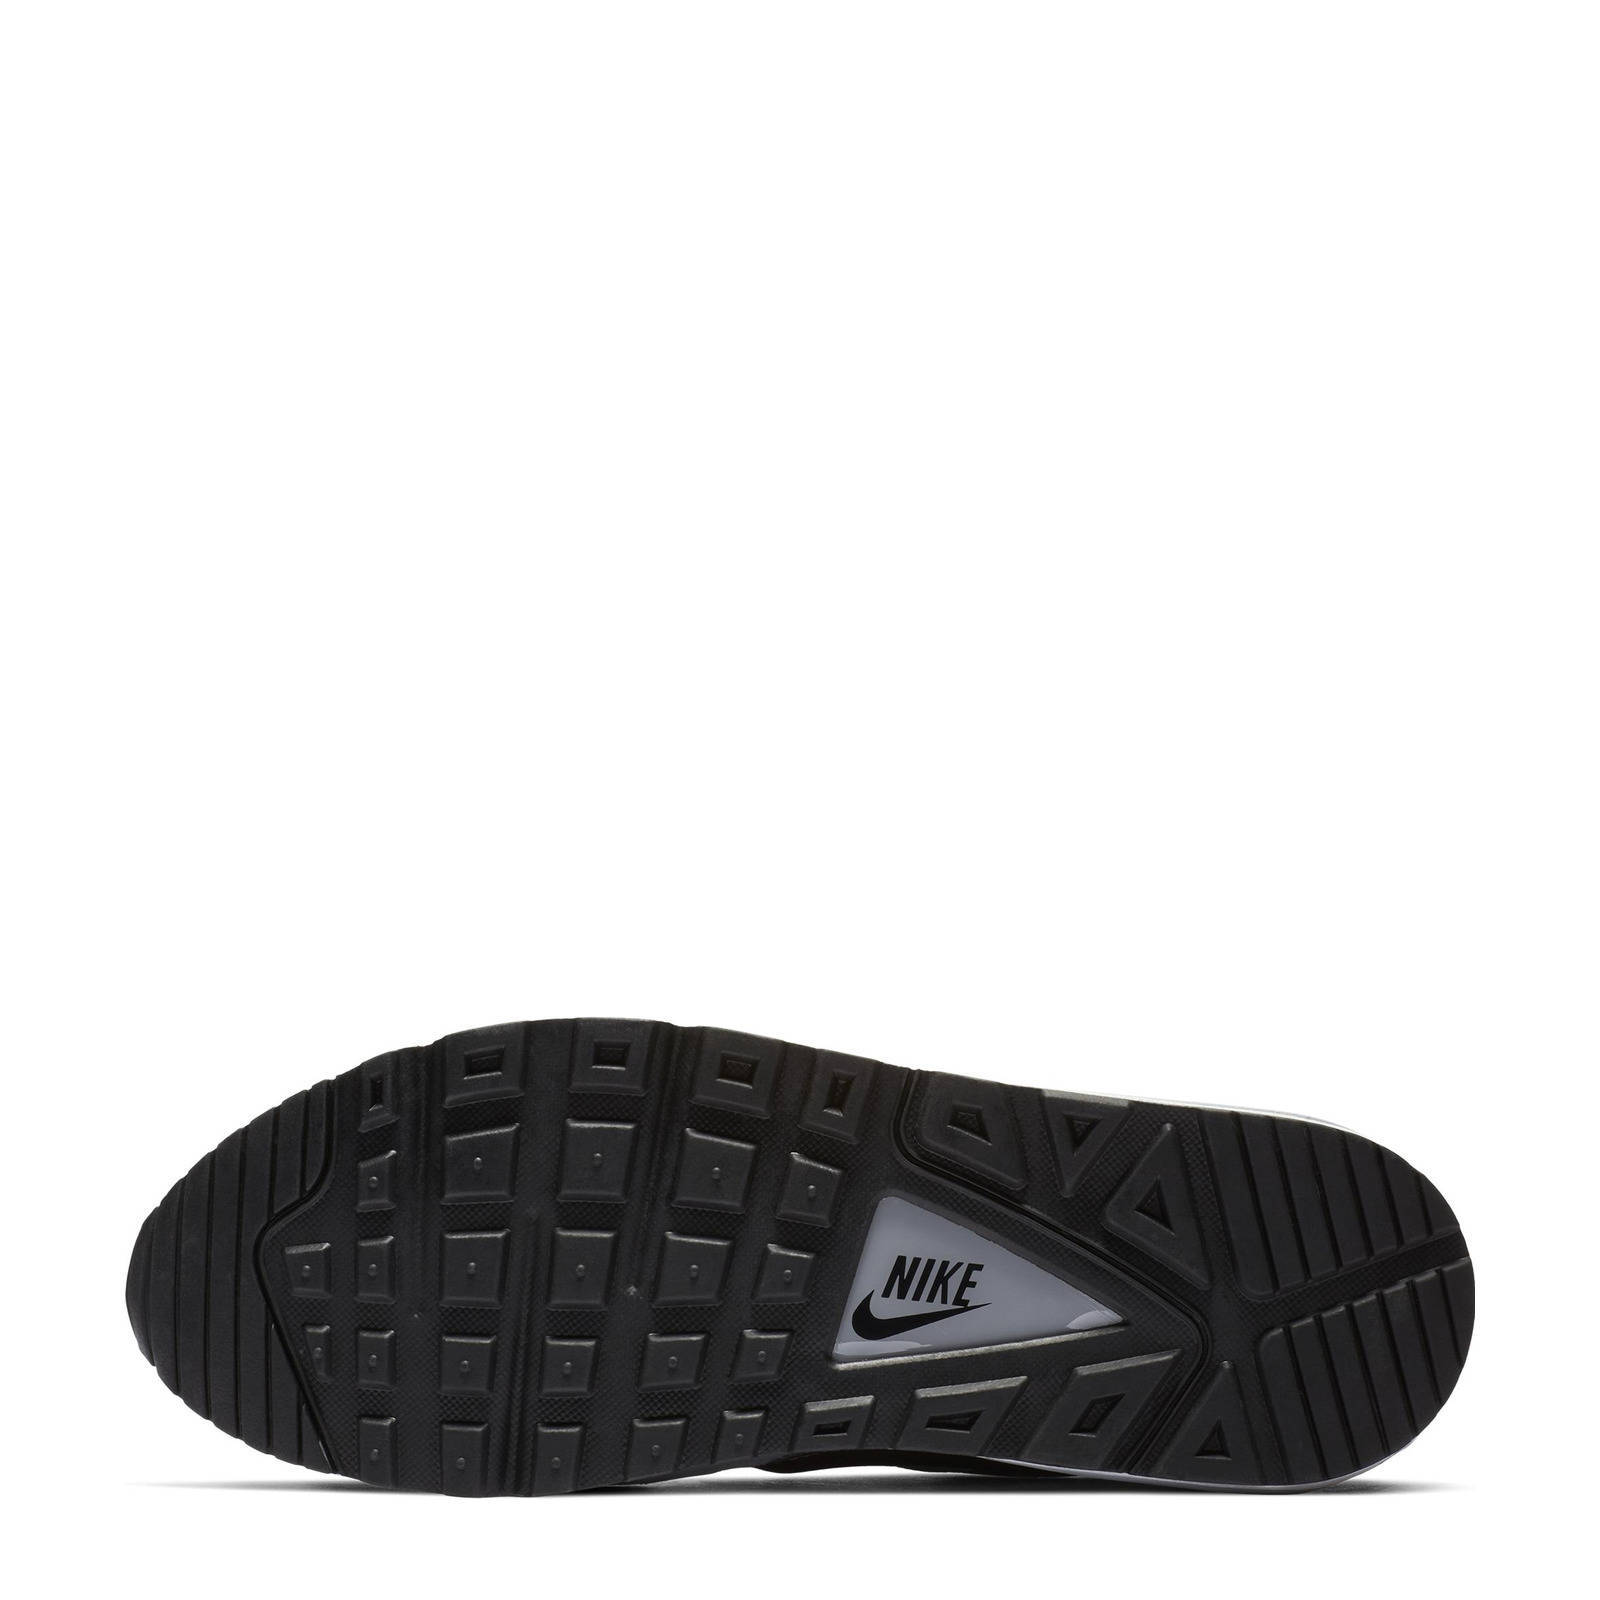 Nike Air Max Command Leather sneakers blauwzilver Nike